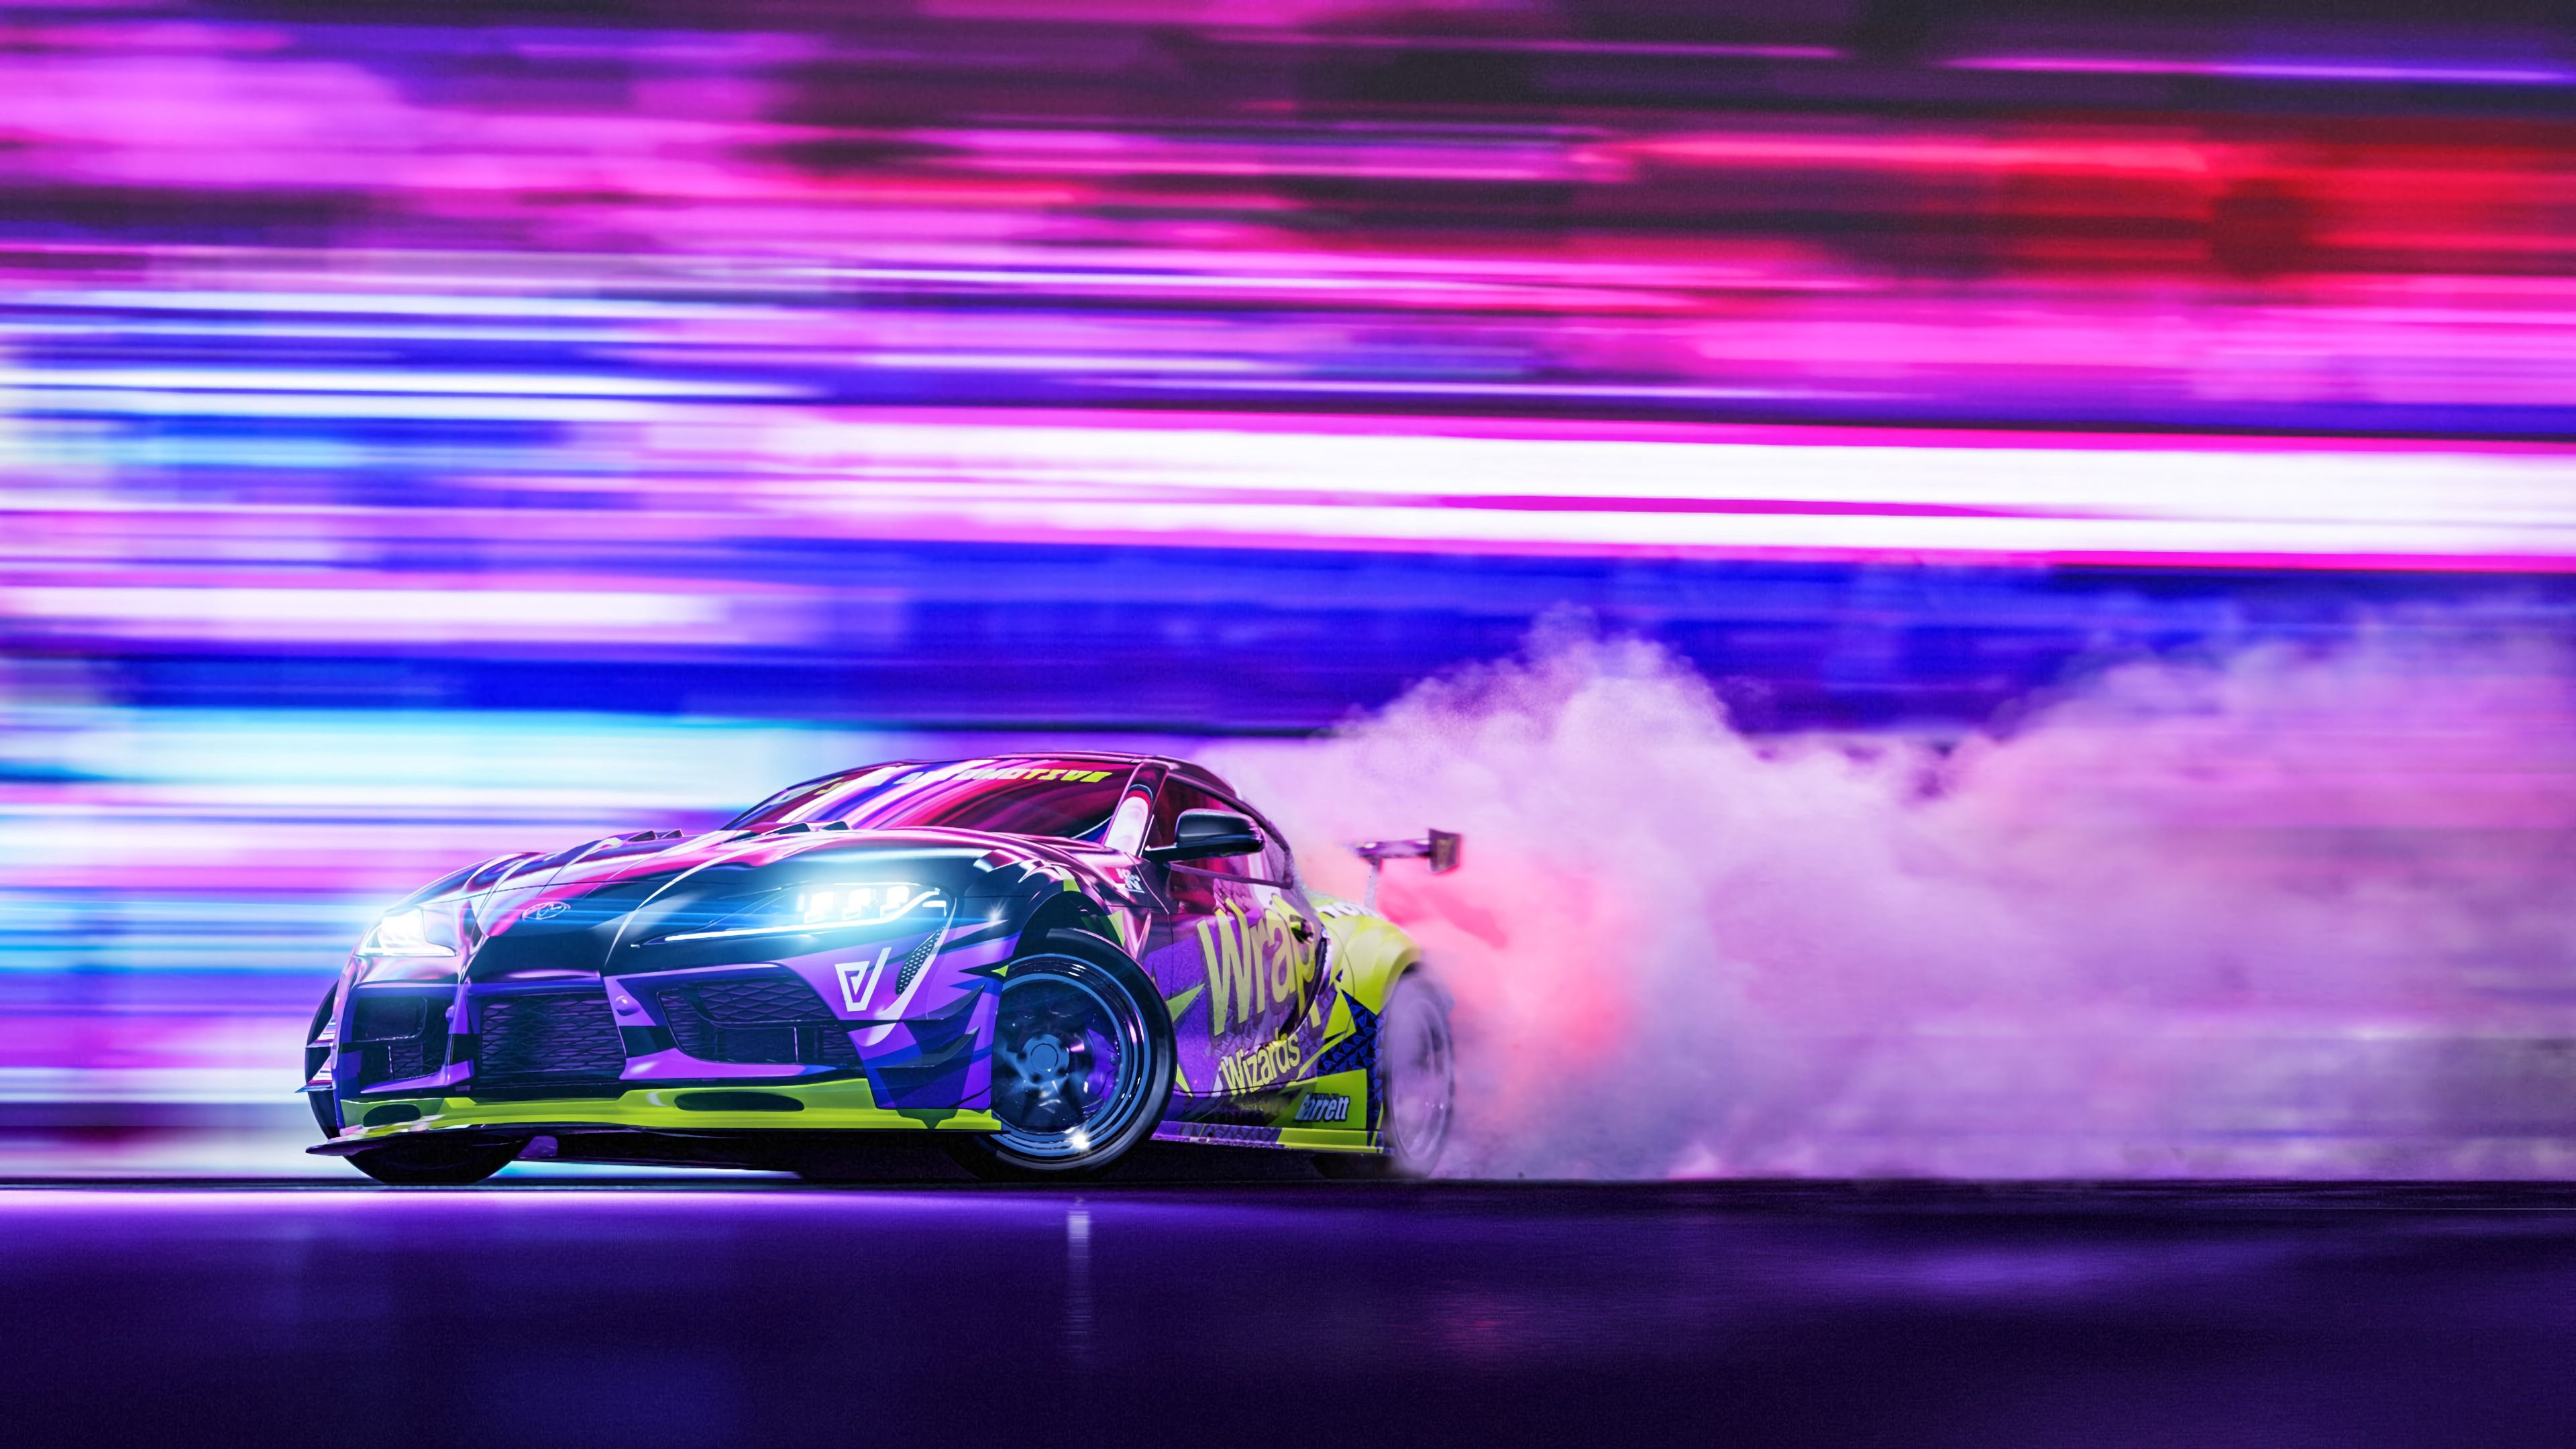 Sportscar Drift By Javier Oquendo 3840x2160 In 2021 Toyota Supra Car Wallpapers Toyota Supra Mk4